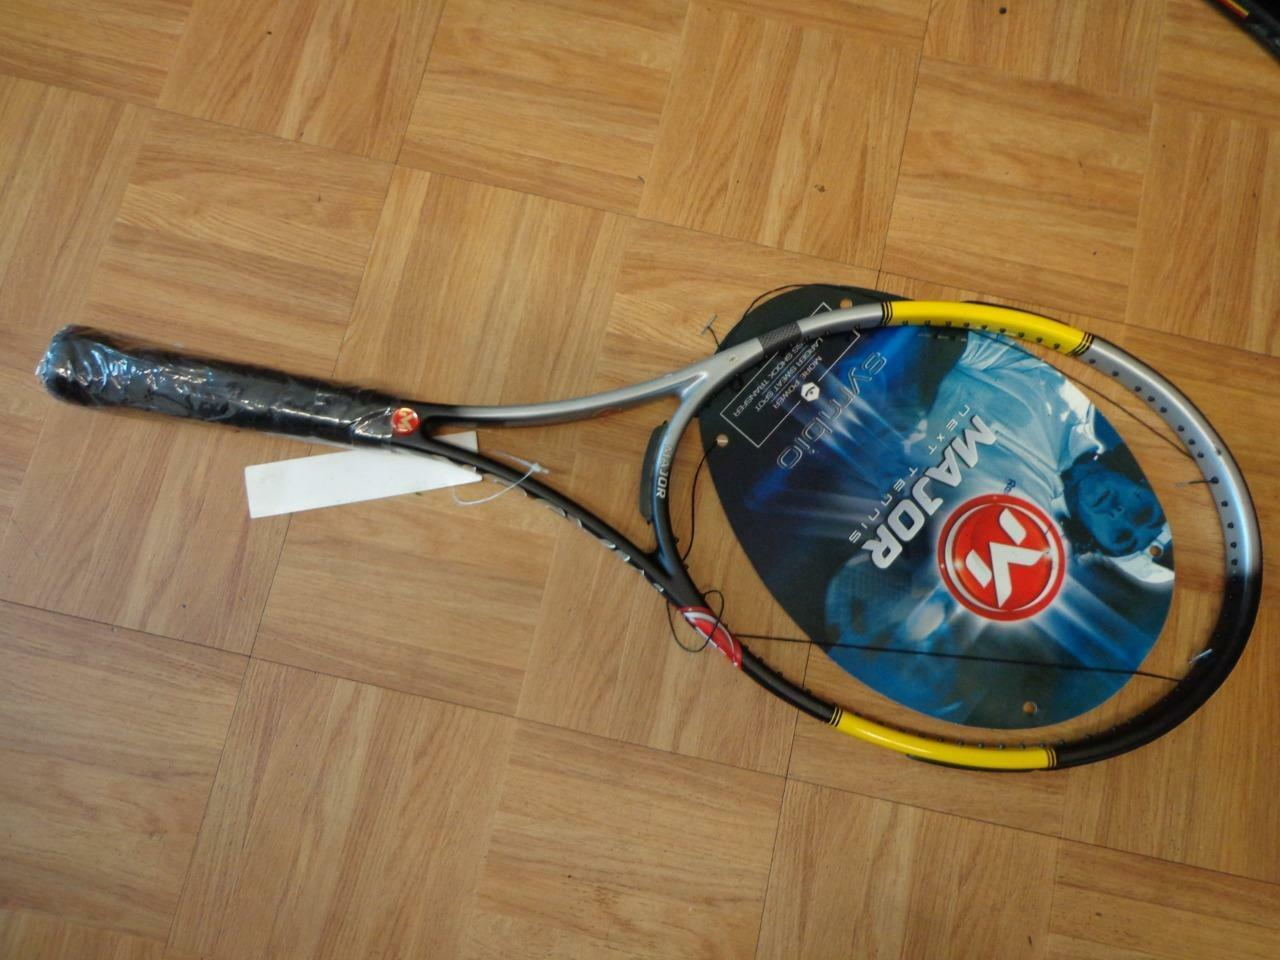 NEW Major Tecnifibre Bullit Symbio Midplus 16x19 4 3 8 grip Tennis Racquet